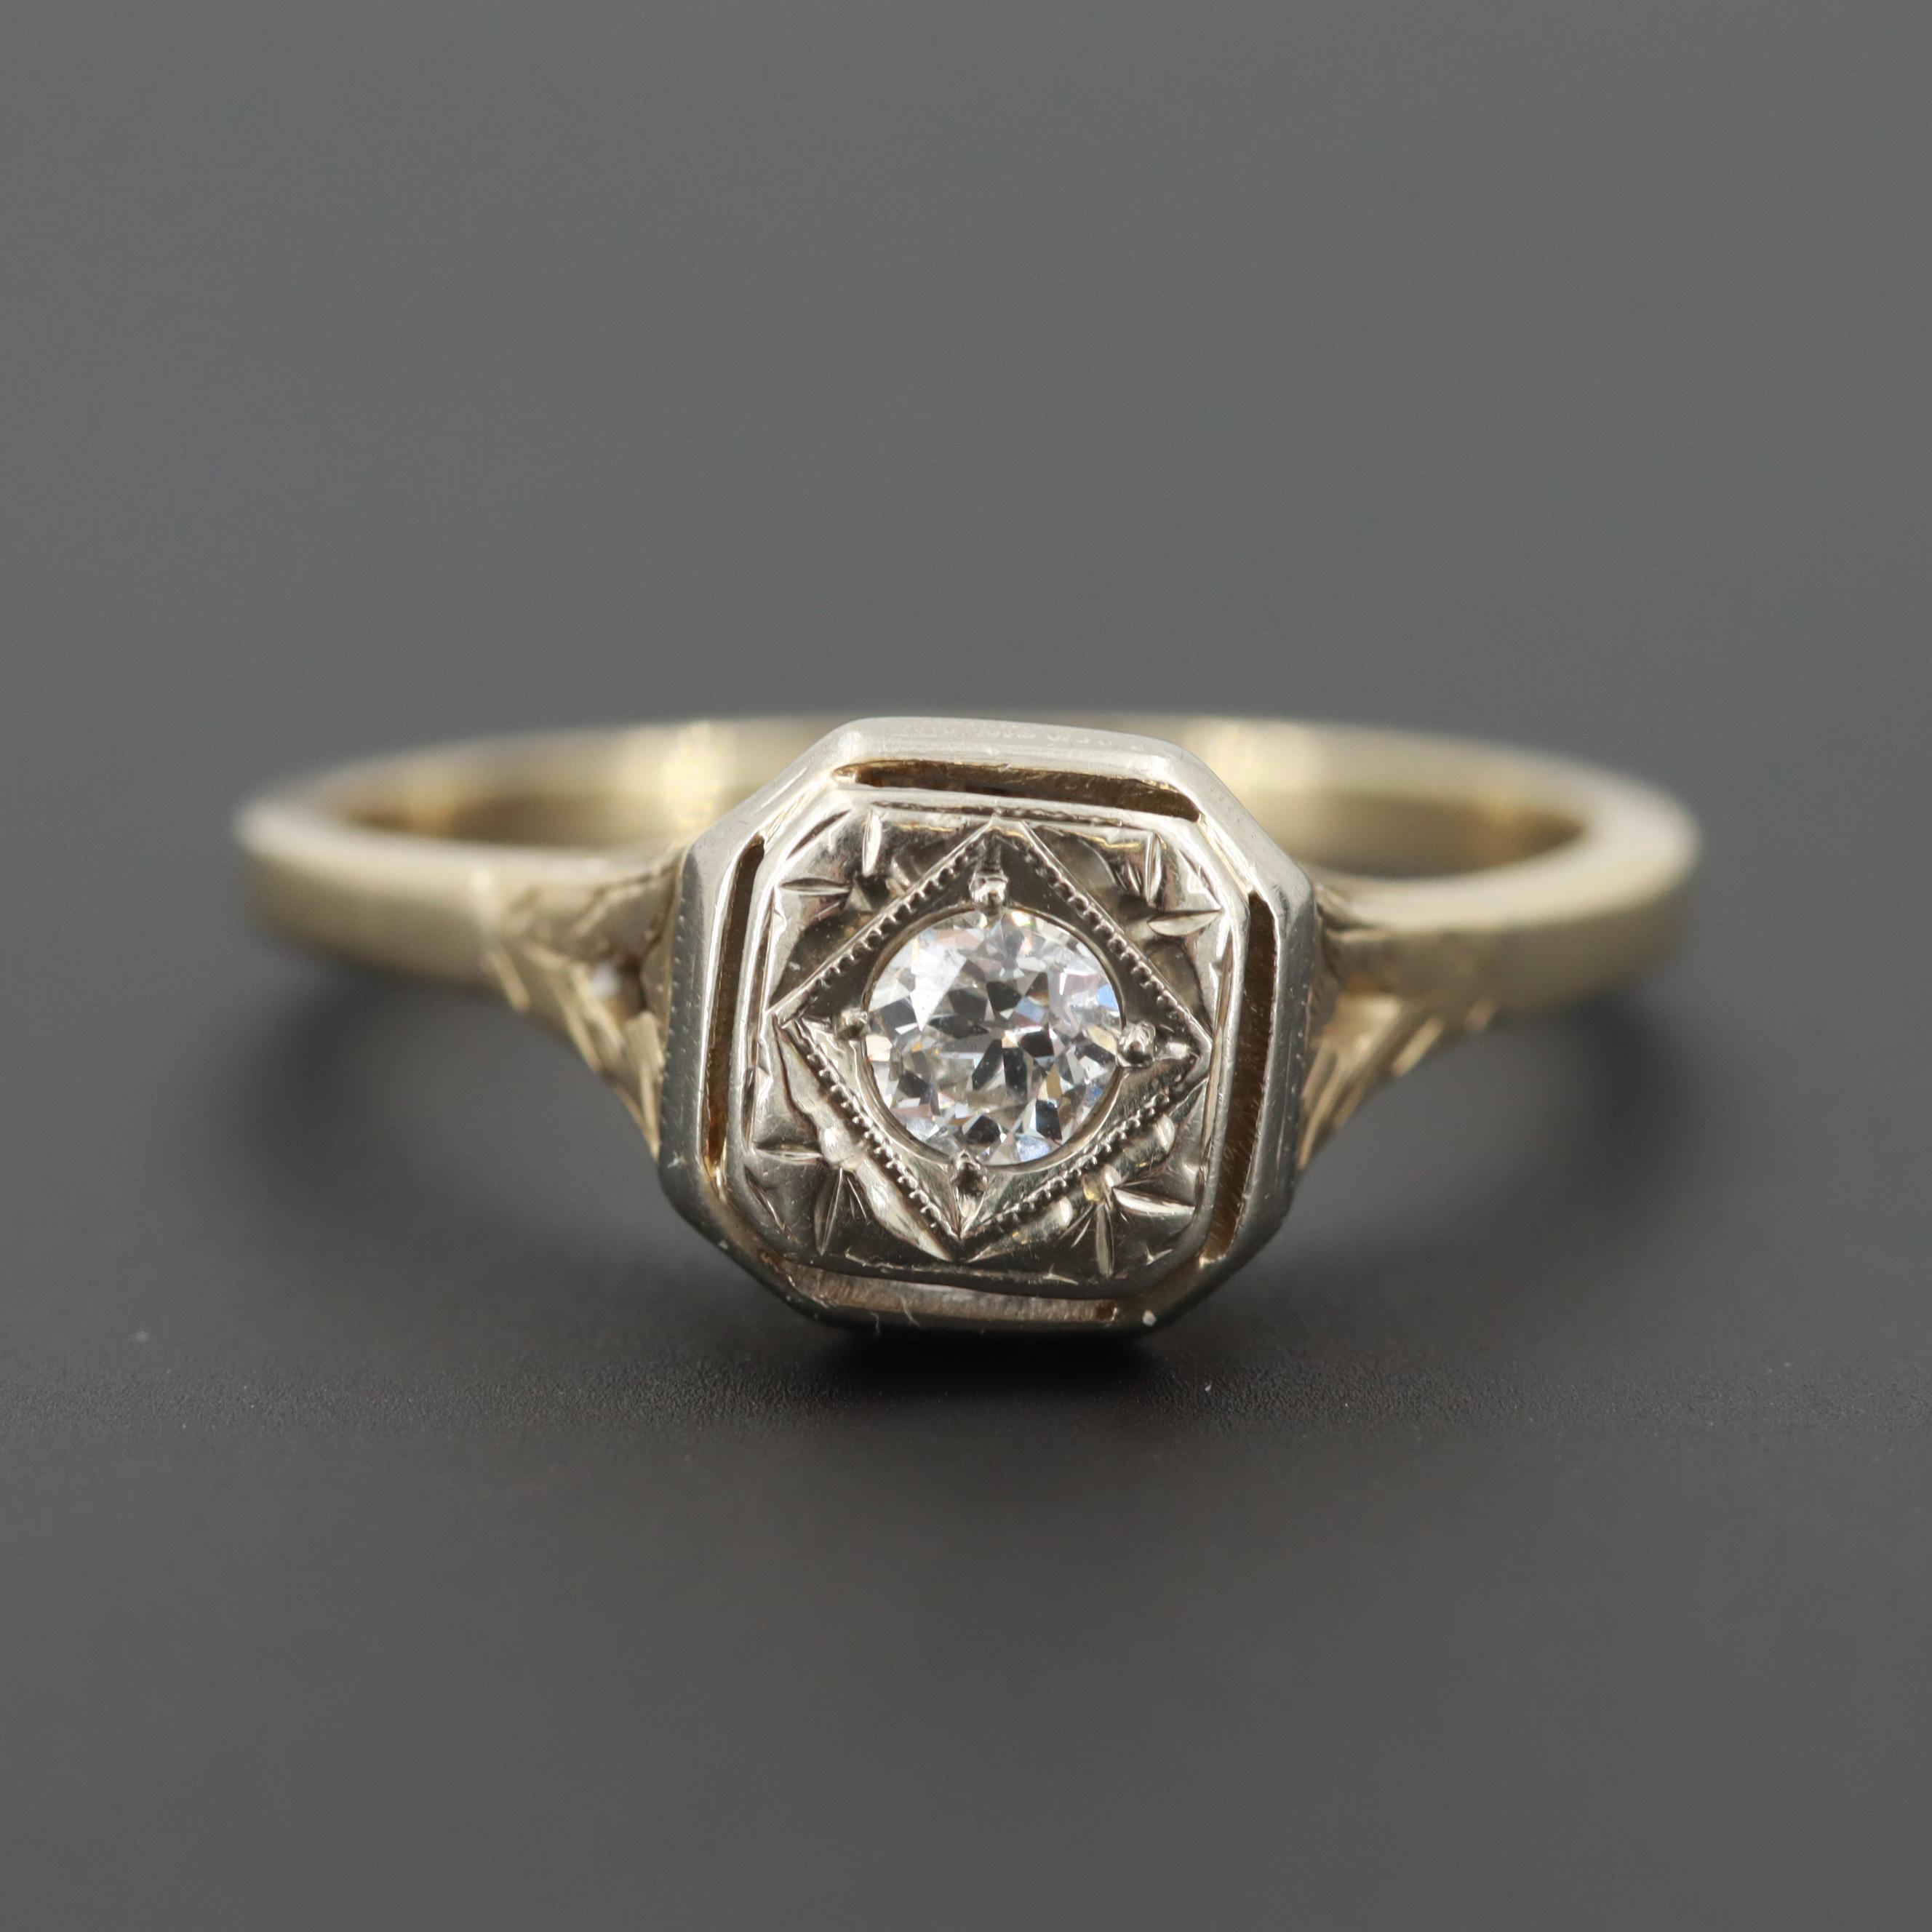 Vintage 14K Yellow Gold Diamond Ring with 18K White Gold Top Trim